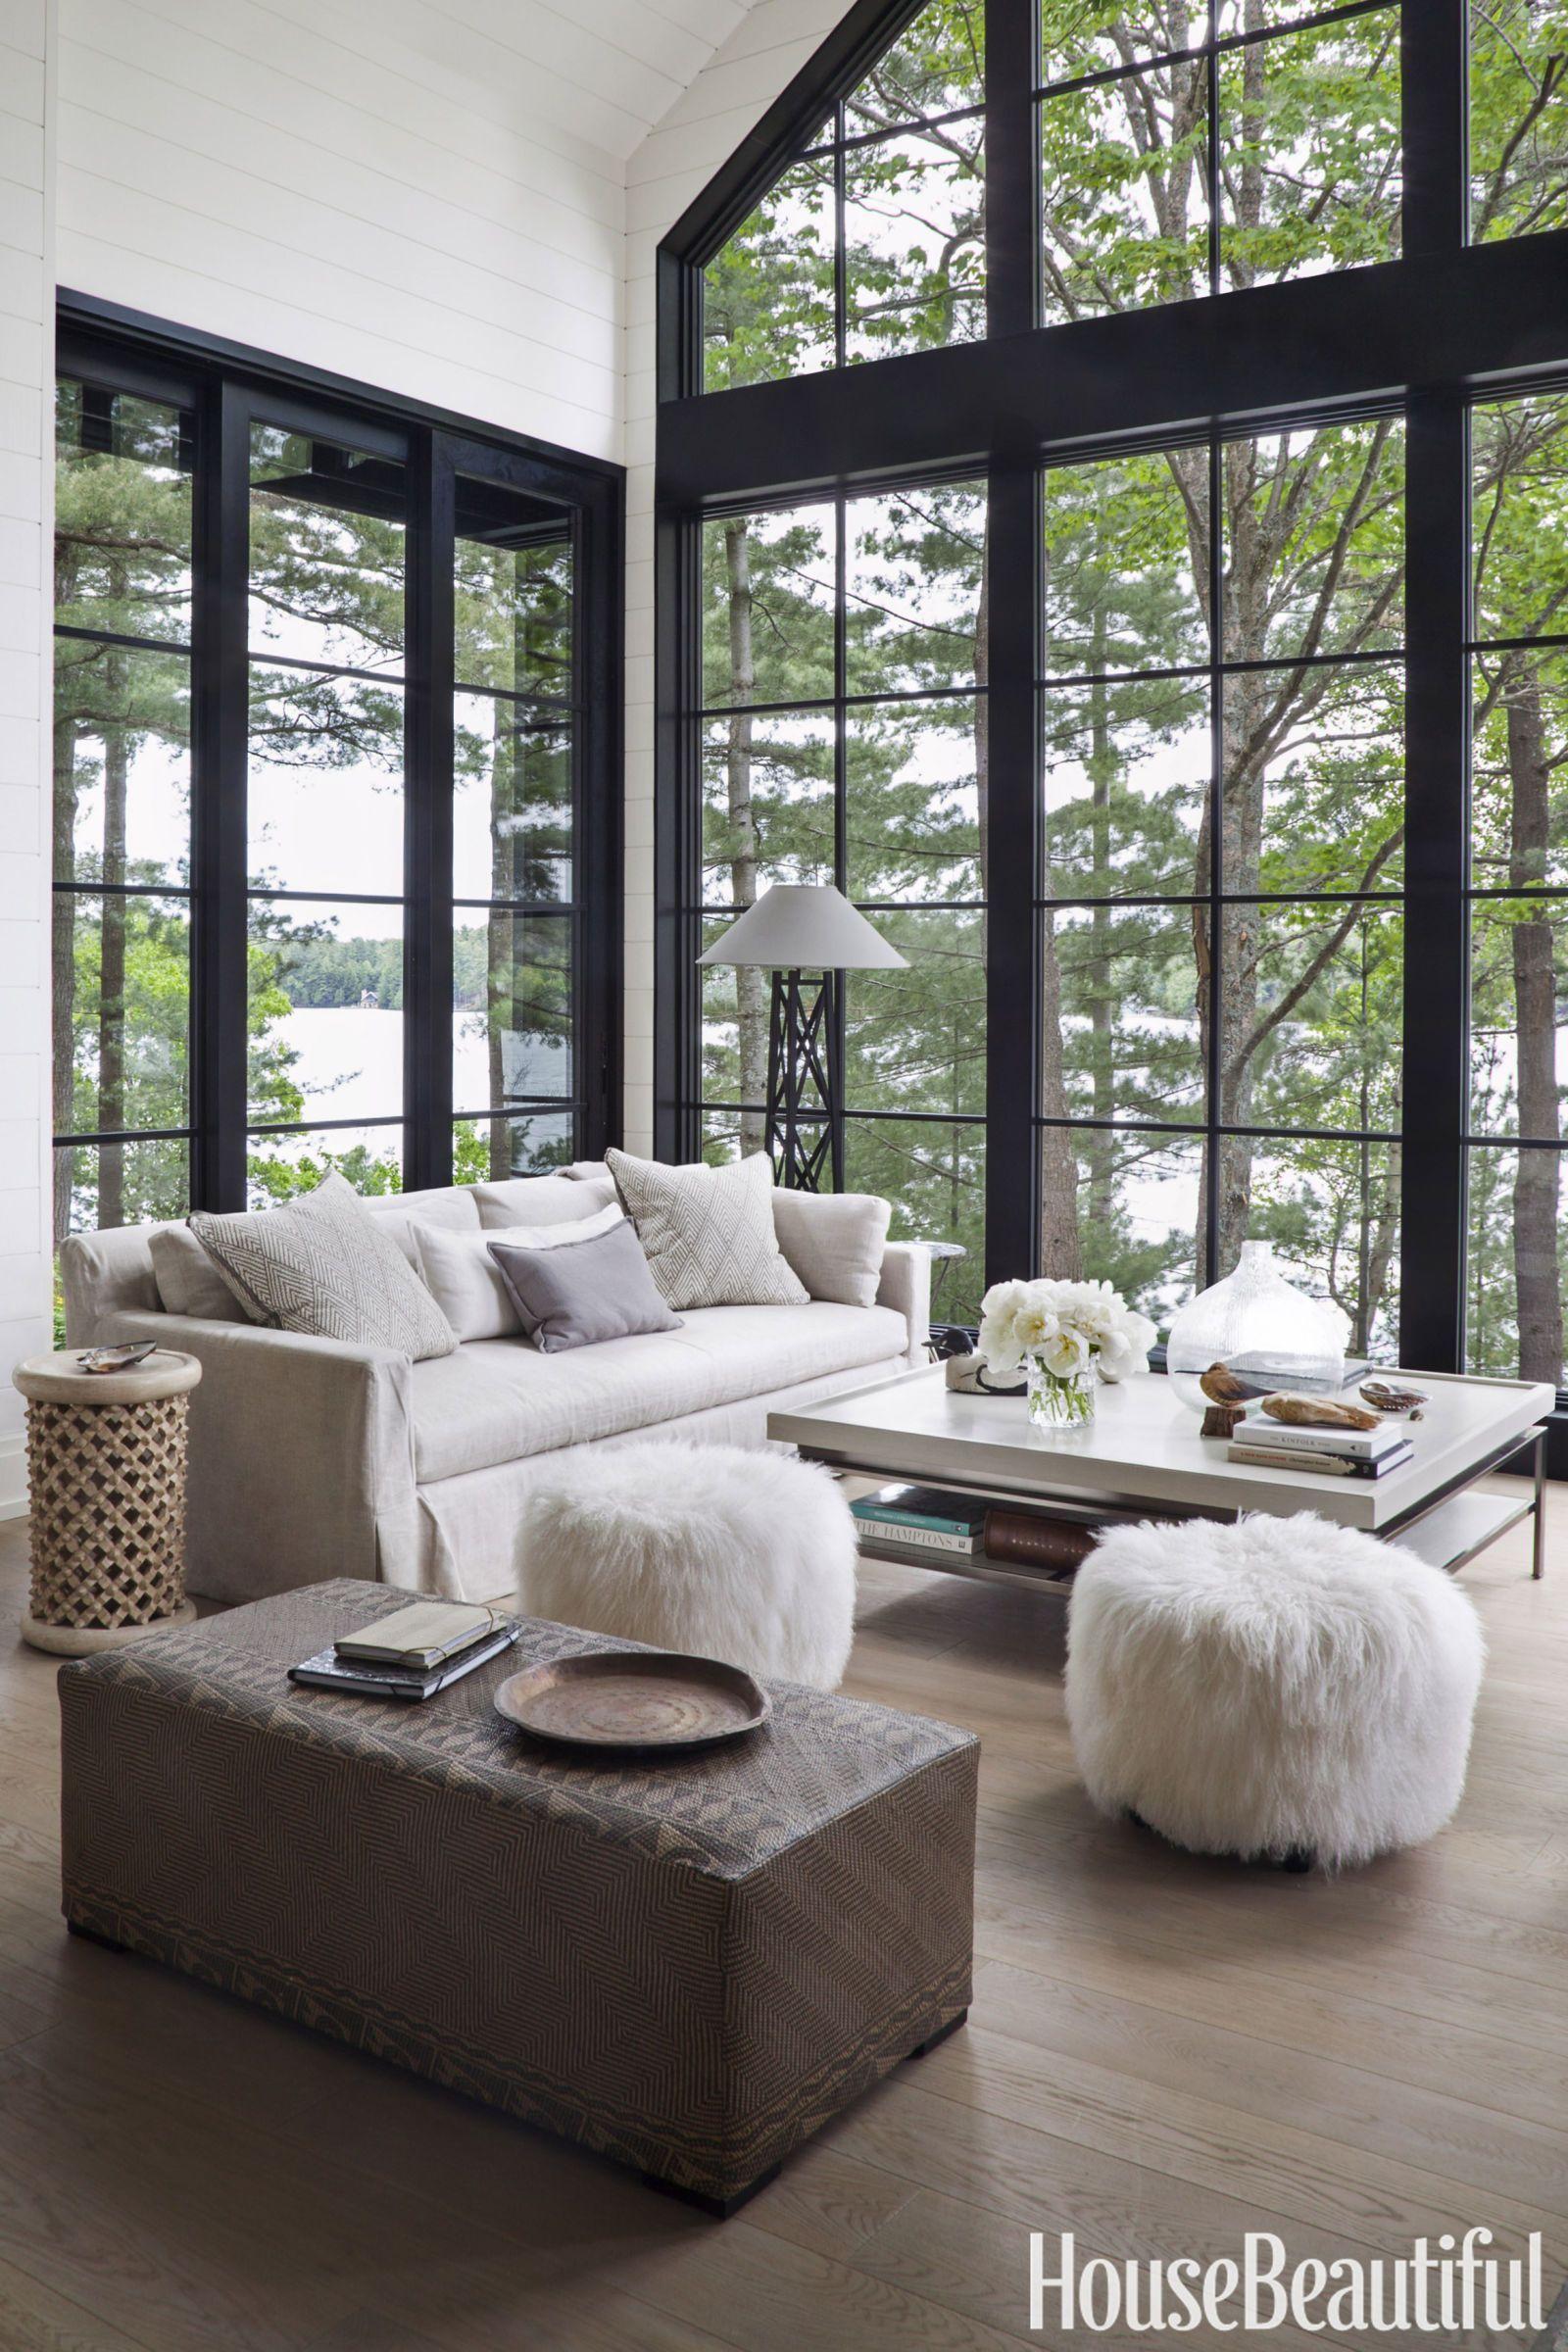 Etonnant Love The Big Open Widows   Living Room: Walls   HouseBeautiful.com